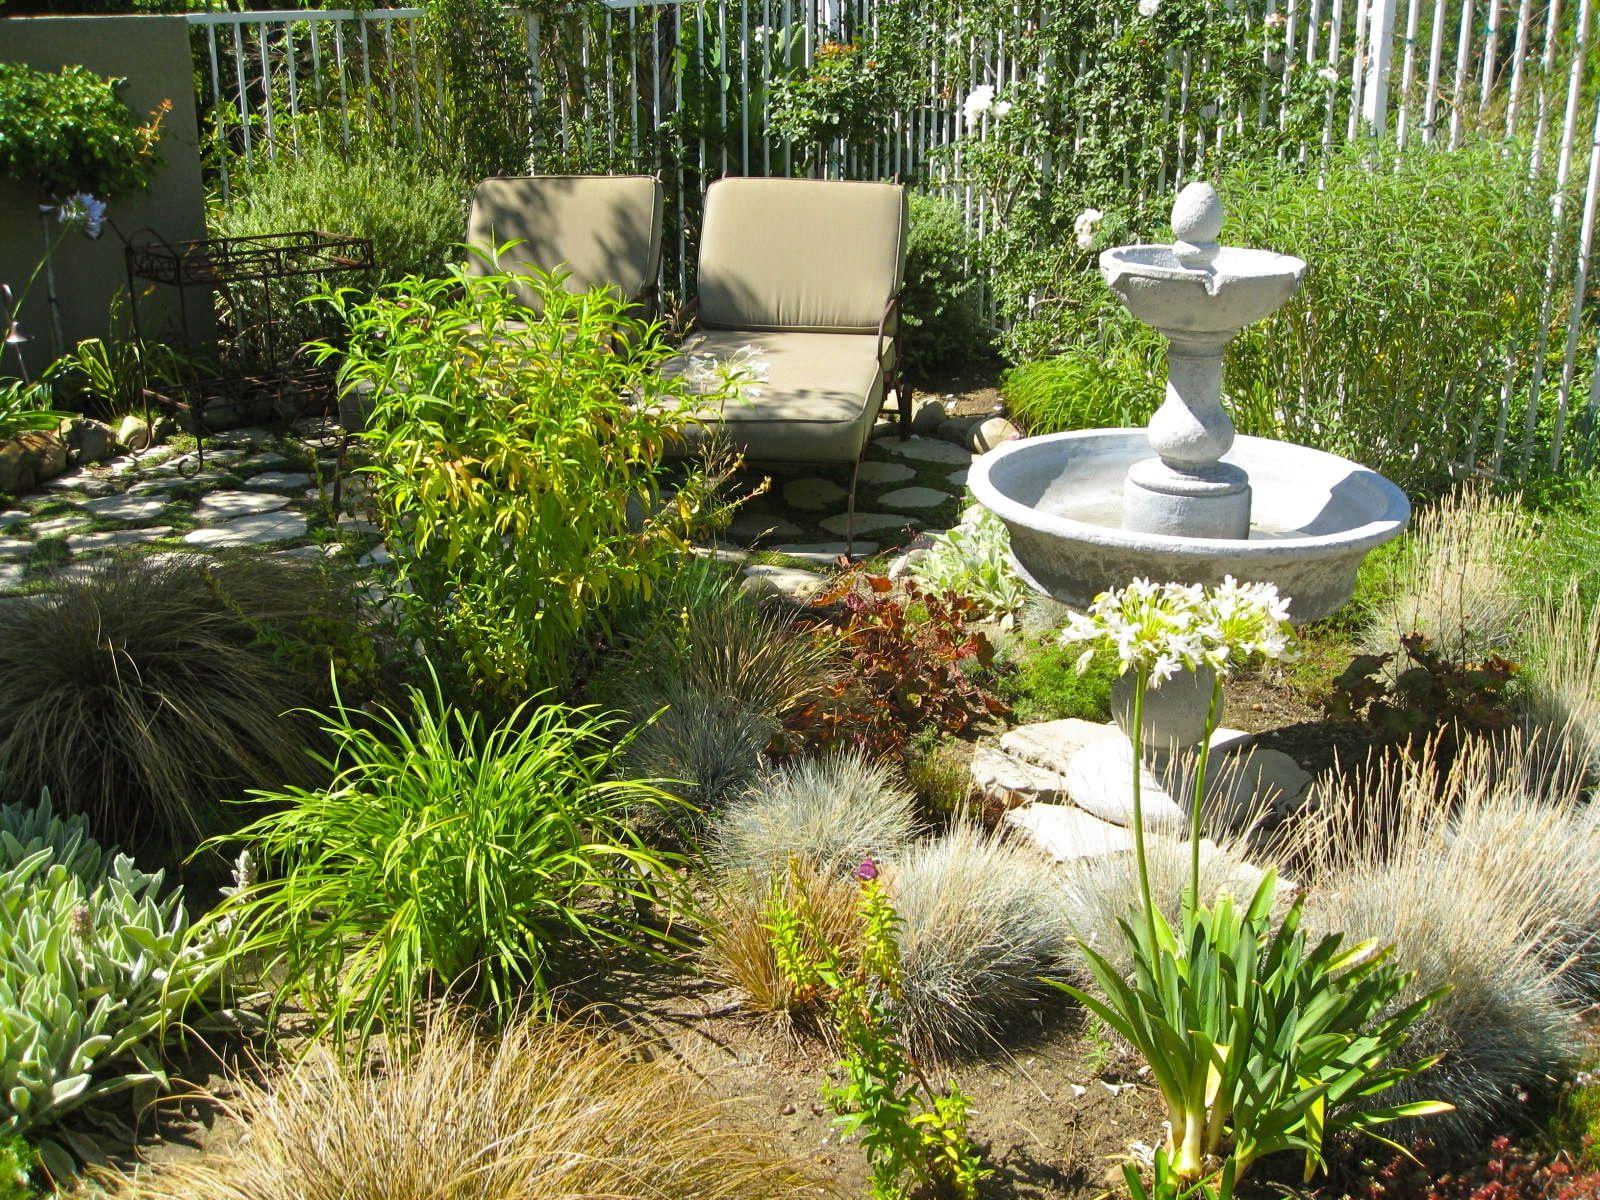 Astonishing Cheap No Grass Backyard Ideas | No grass ... on Cheap No Grass Backyard Ideas  id=94502